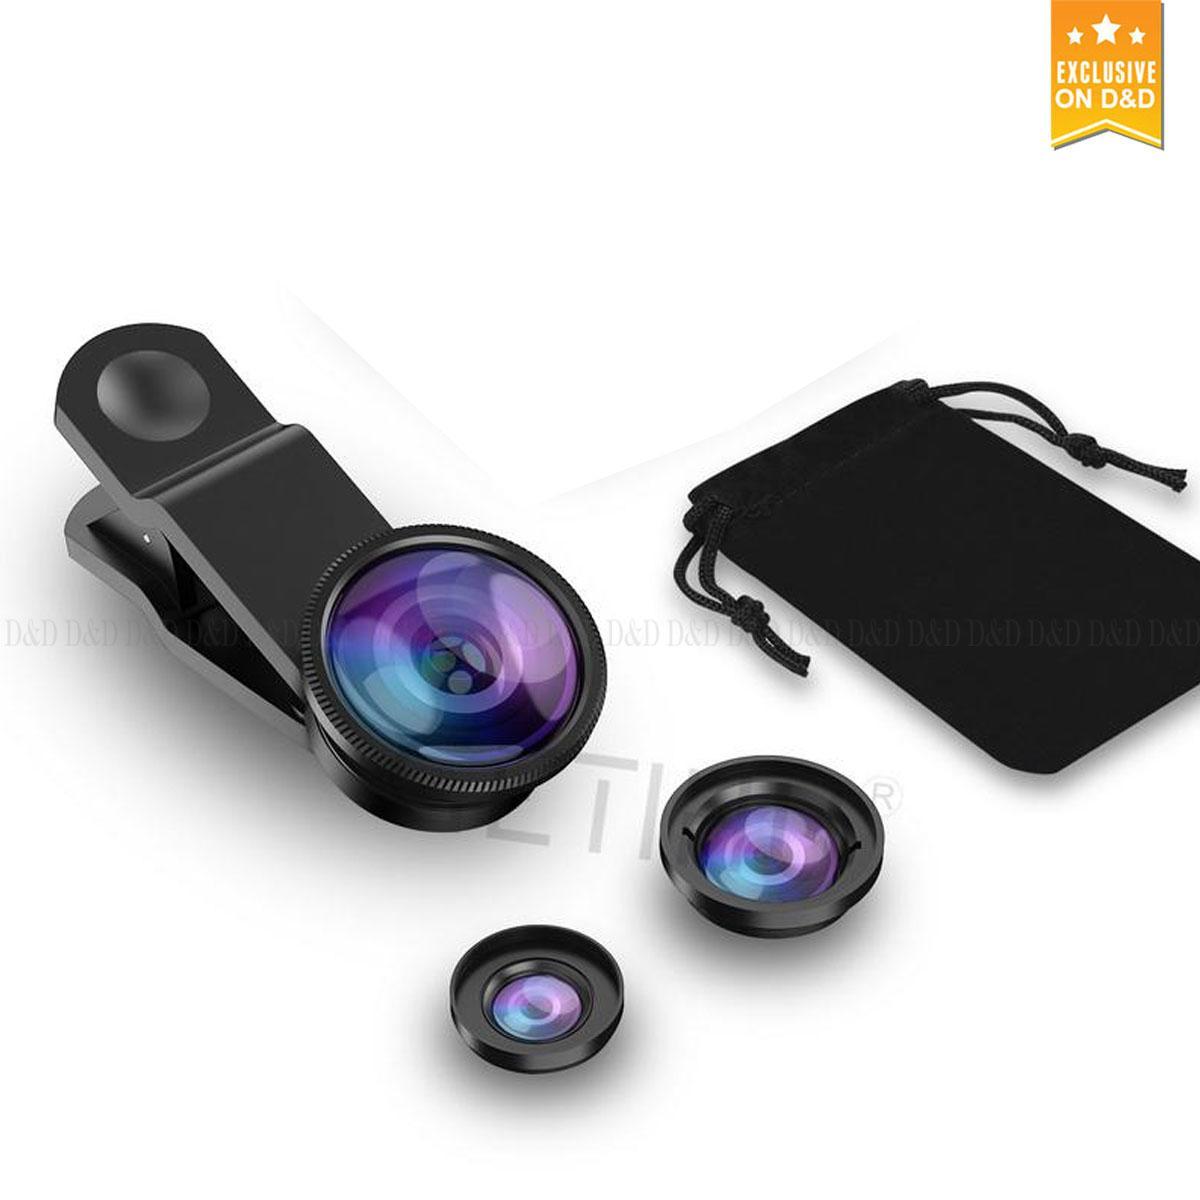 Universal Clip Mobile Phone Camera Lens Fisheye + Macro + Wide Angle for iPhone 6 7